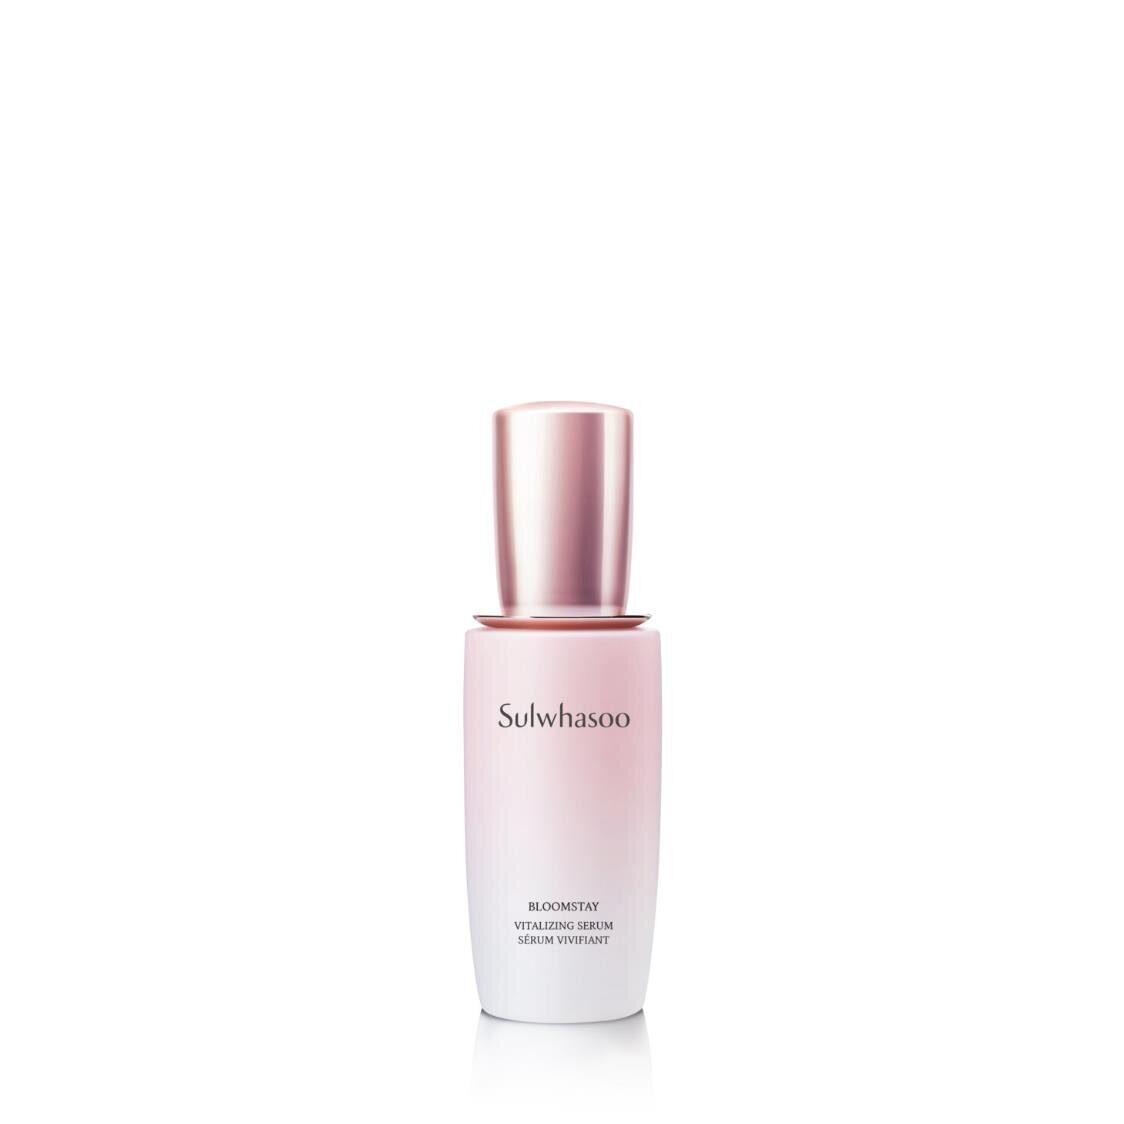 Sulwhasoo Bloomstay Vitalizing Serum 50ml